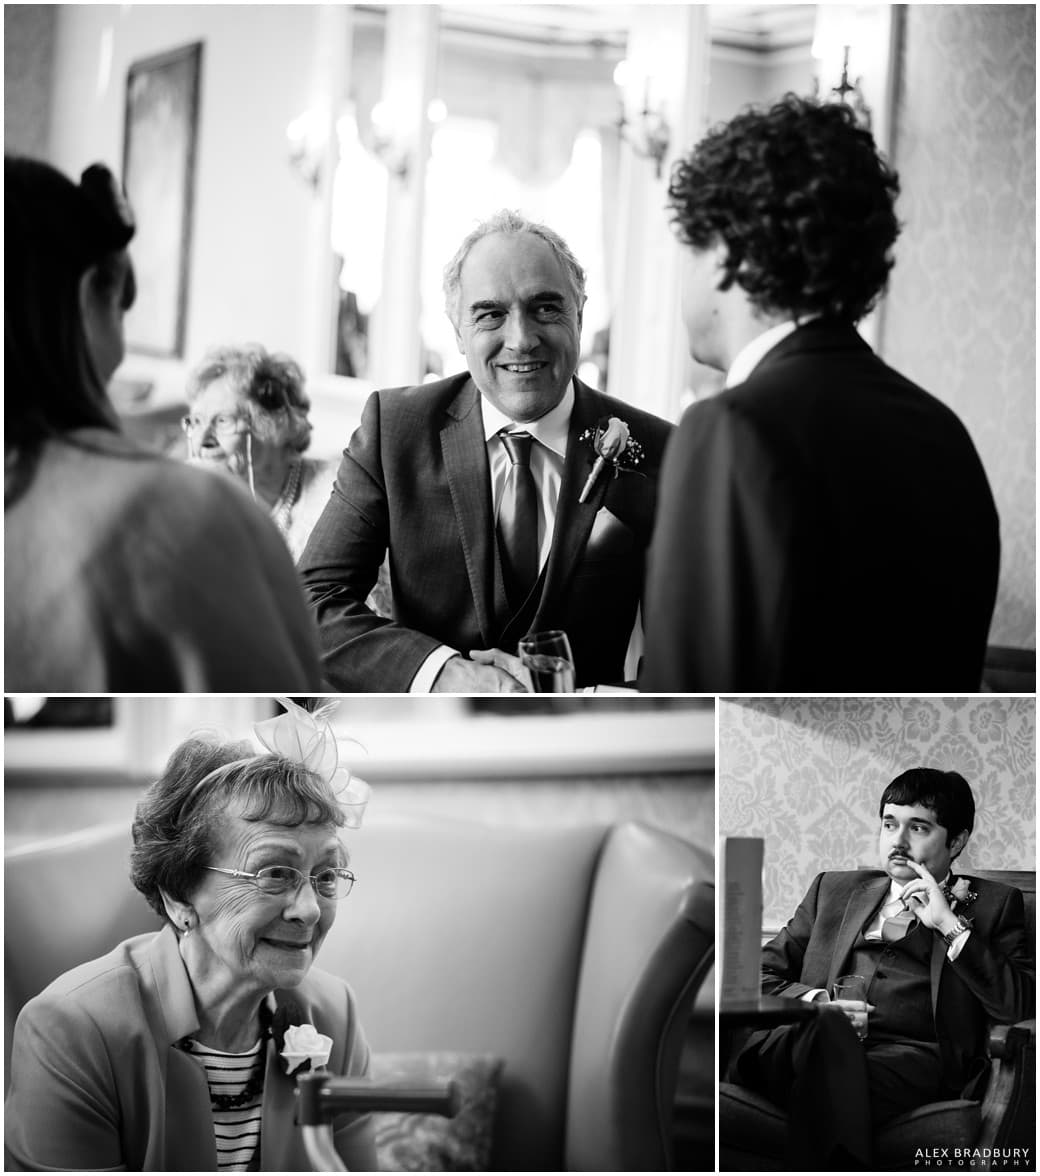 alex-bradbury-ettington-park-hotel-wedding-photography-35